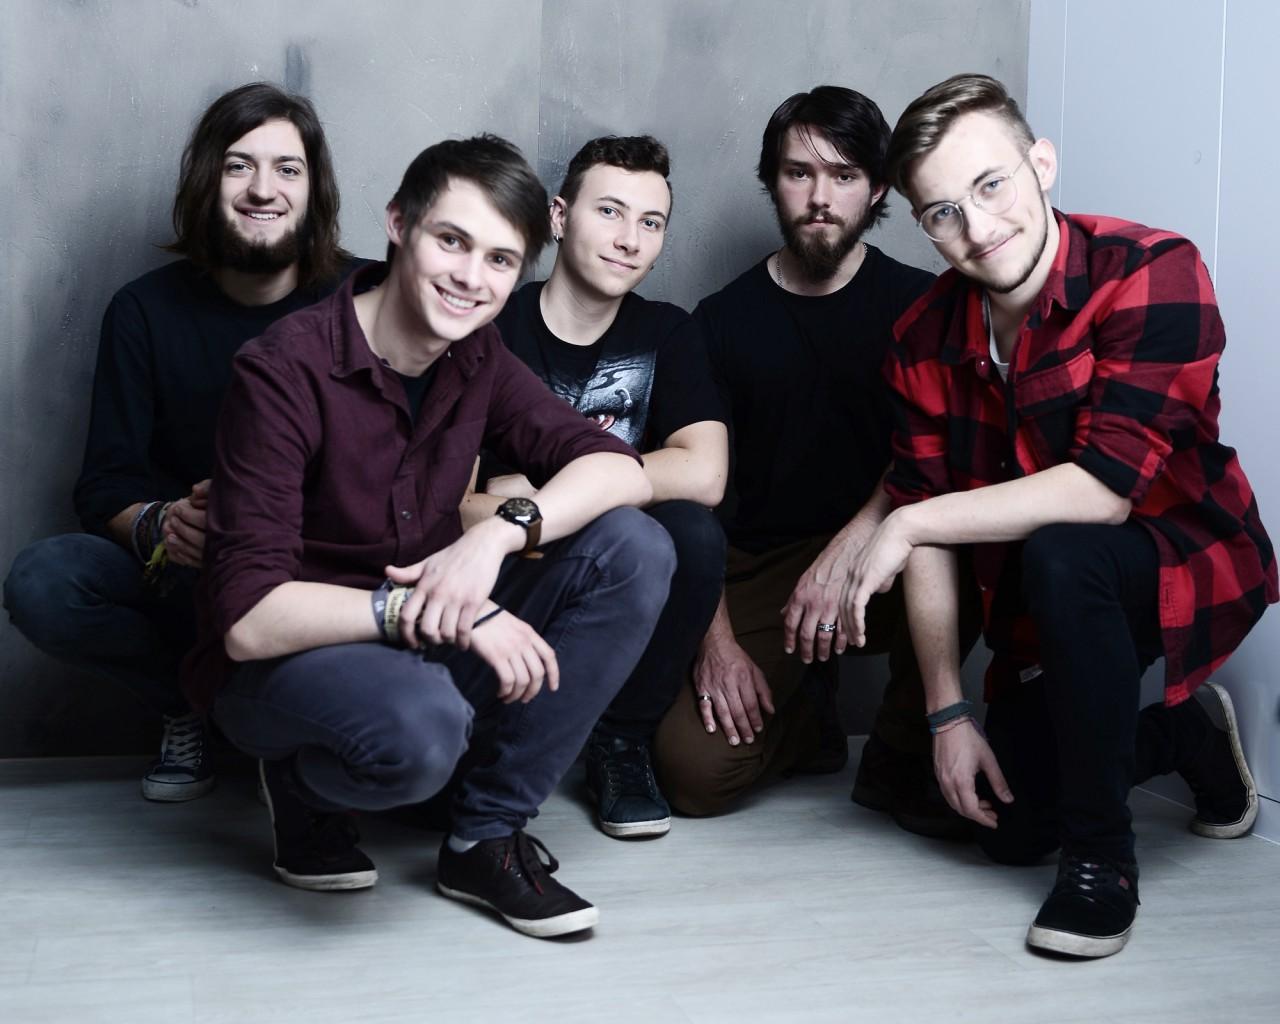 The Final Impact - Valentin, Samuel, Benjamin, Tobias, Matthias